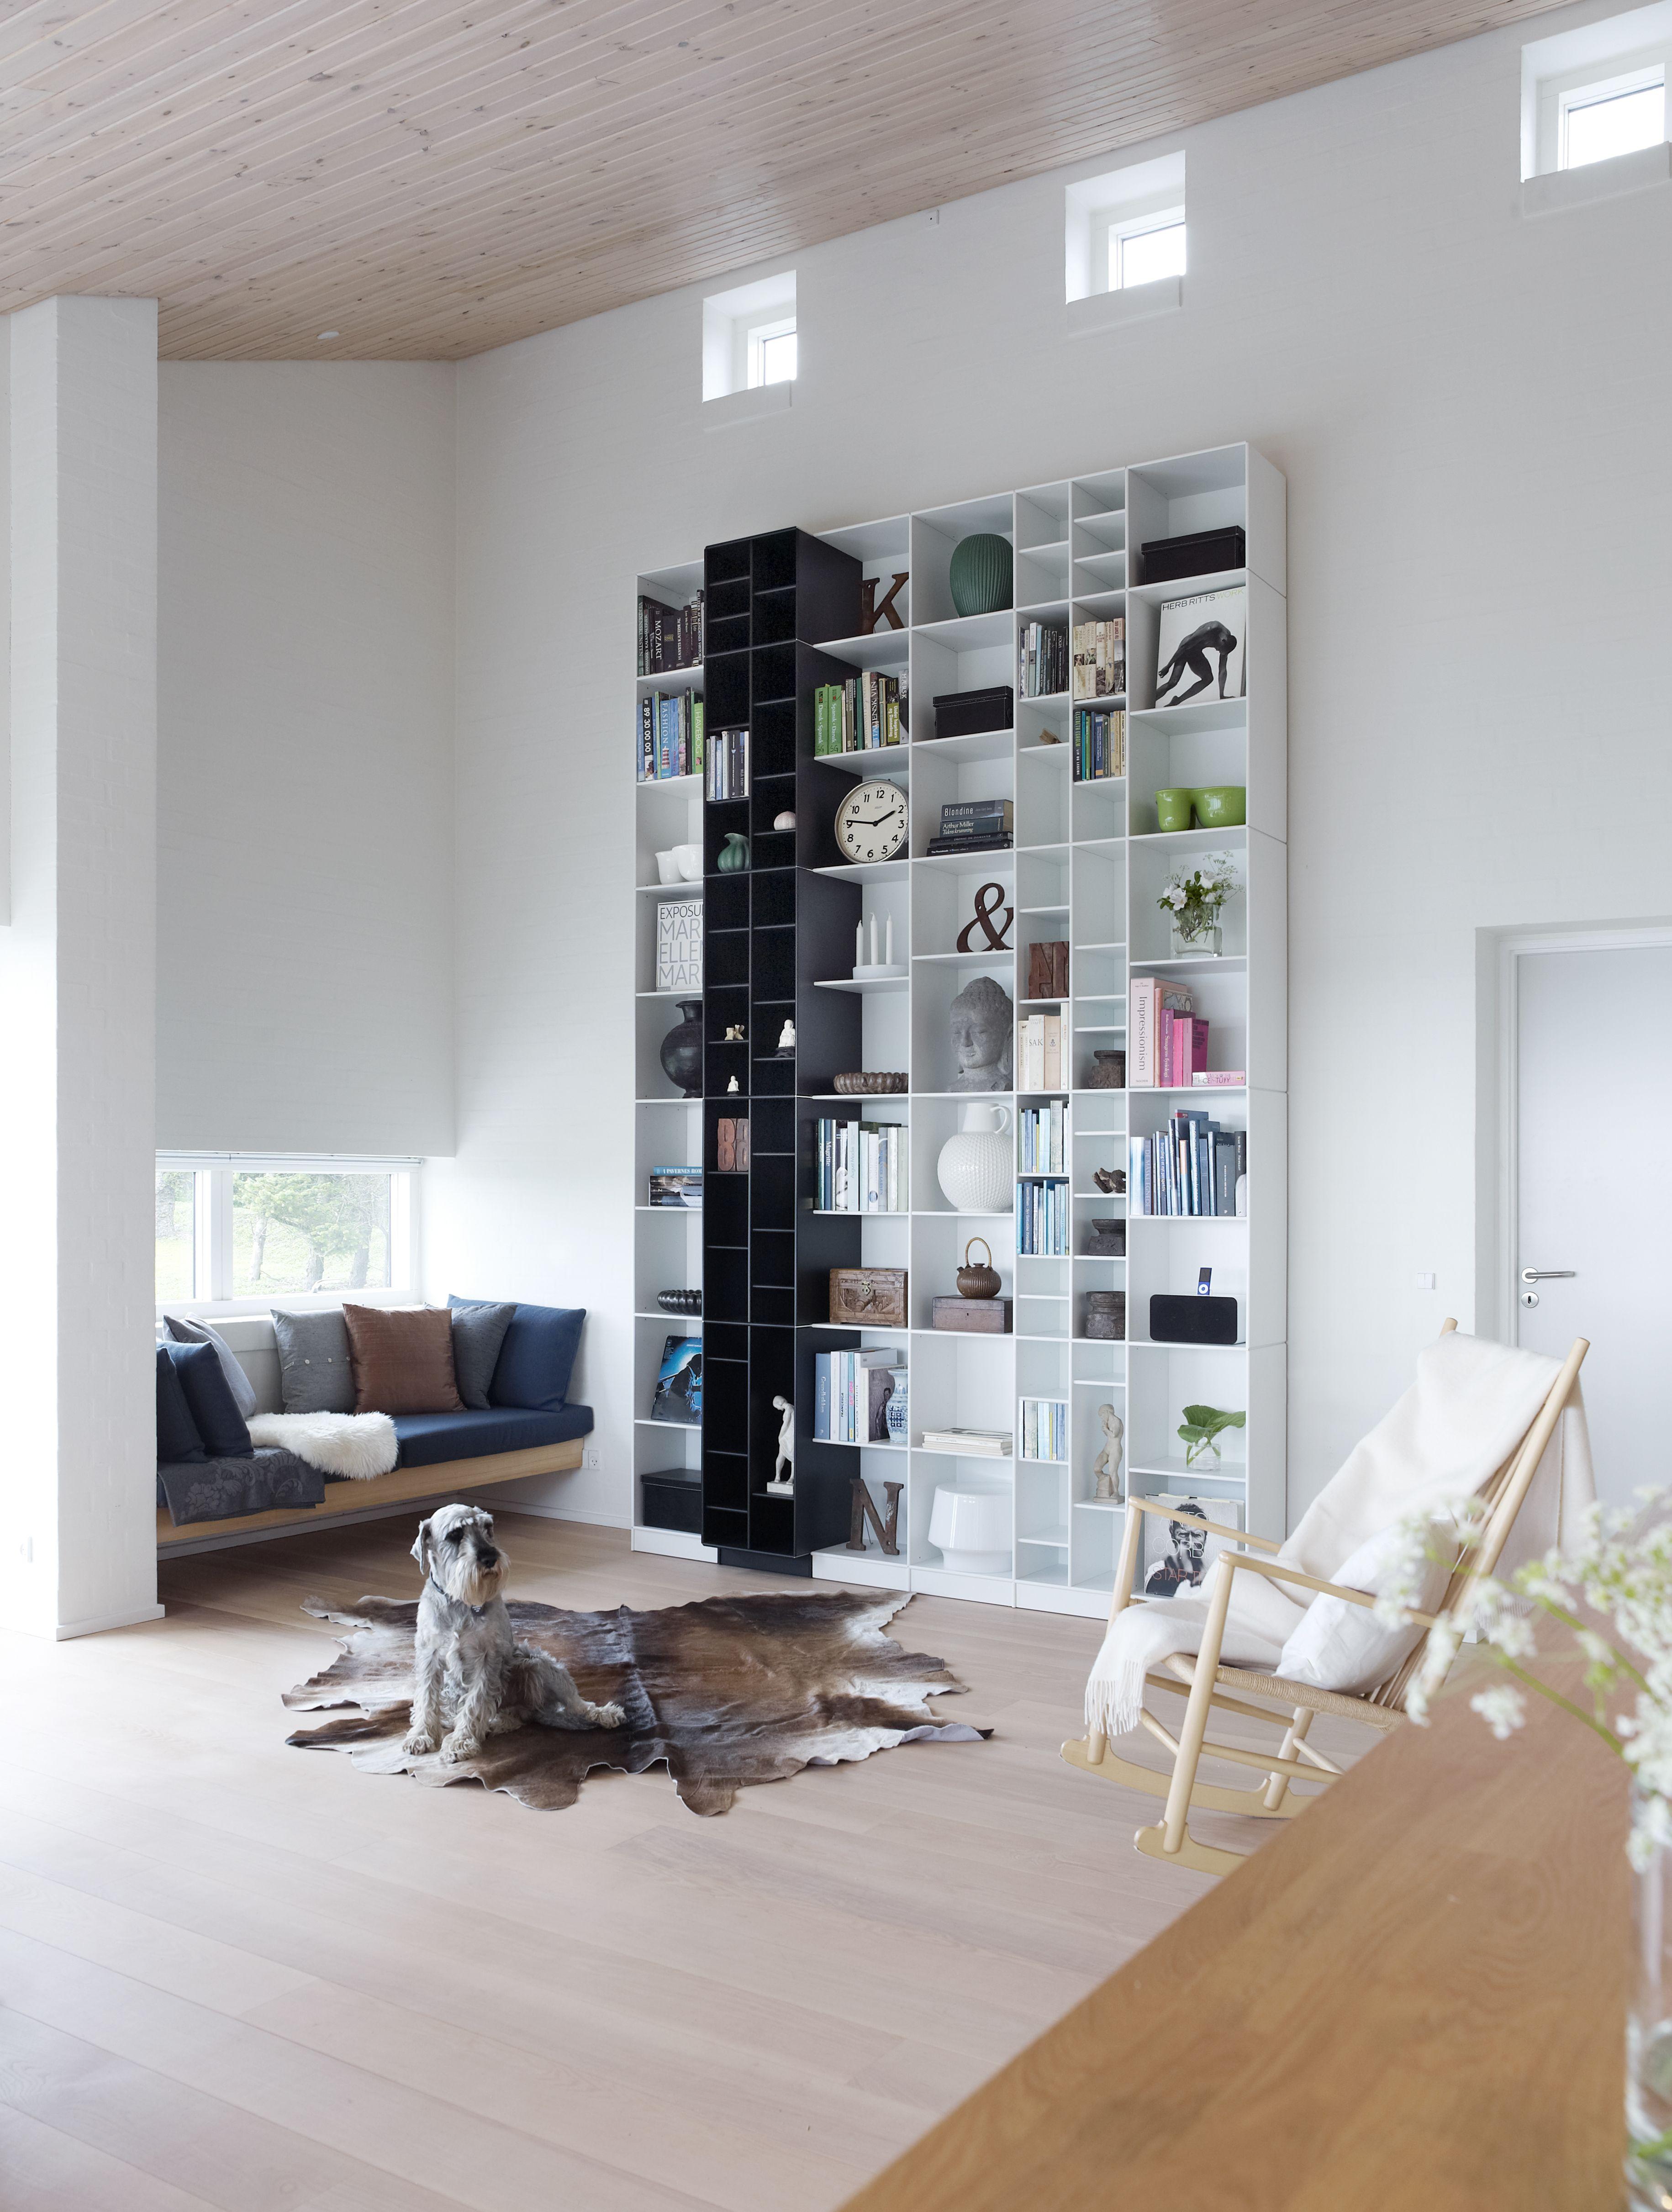 Lundia ABC Quadrant bookshelf - imagine how much stuff the princess ...